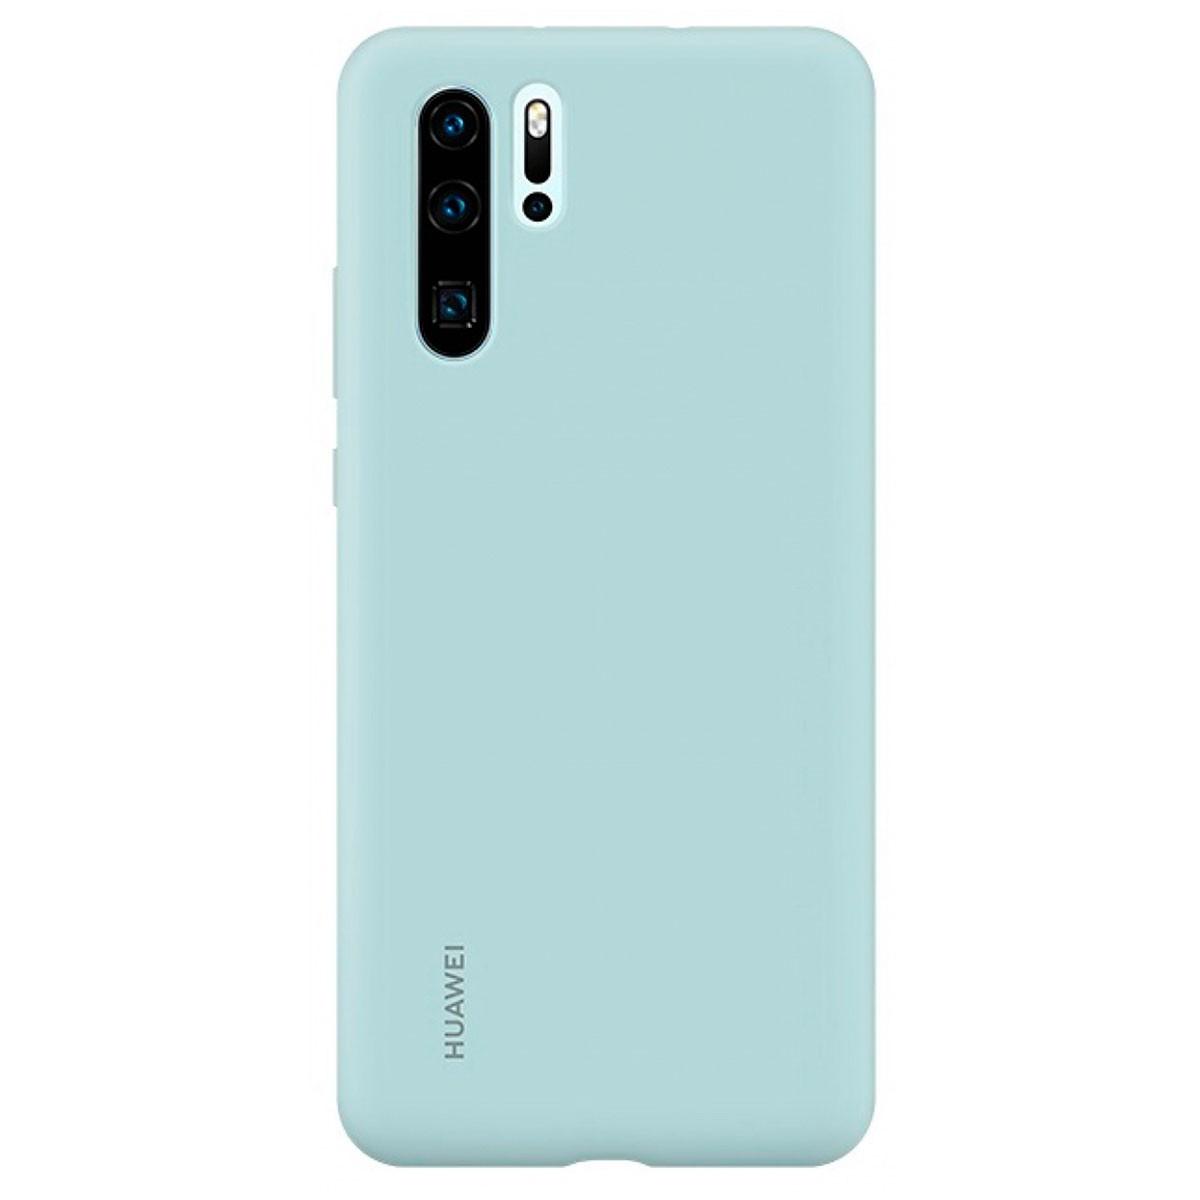 Capa Protetora Silicone Huawei P30 Pro Azul Original